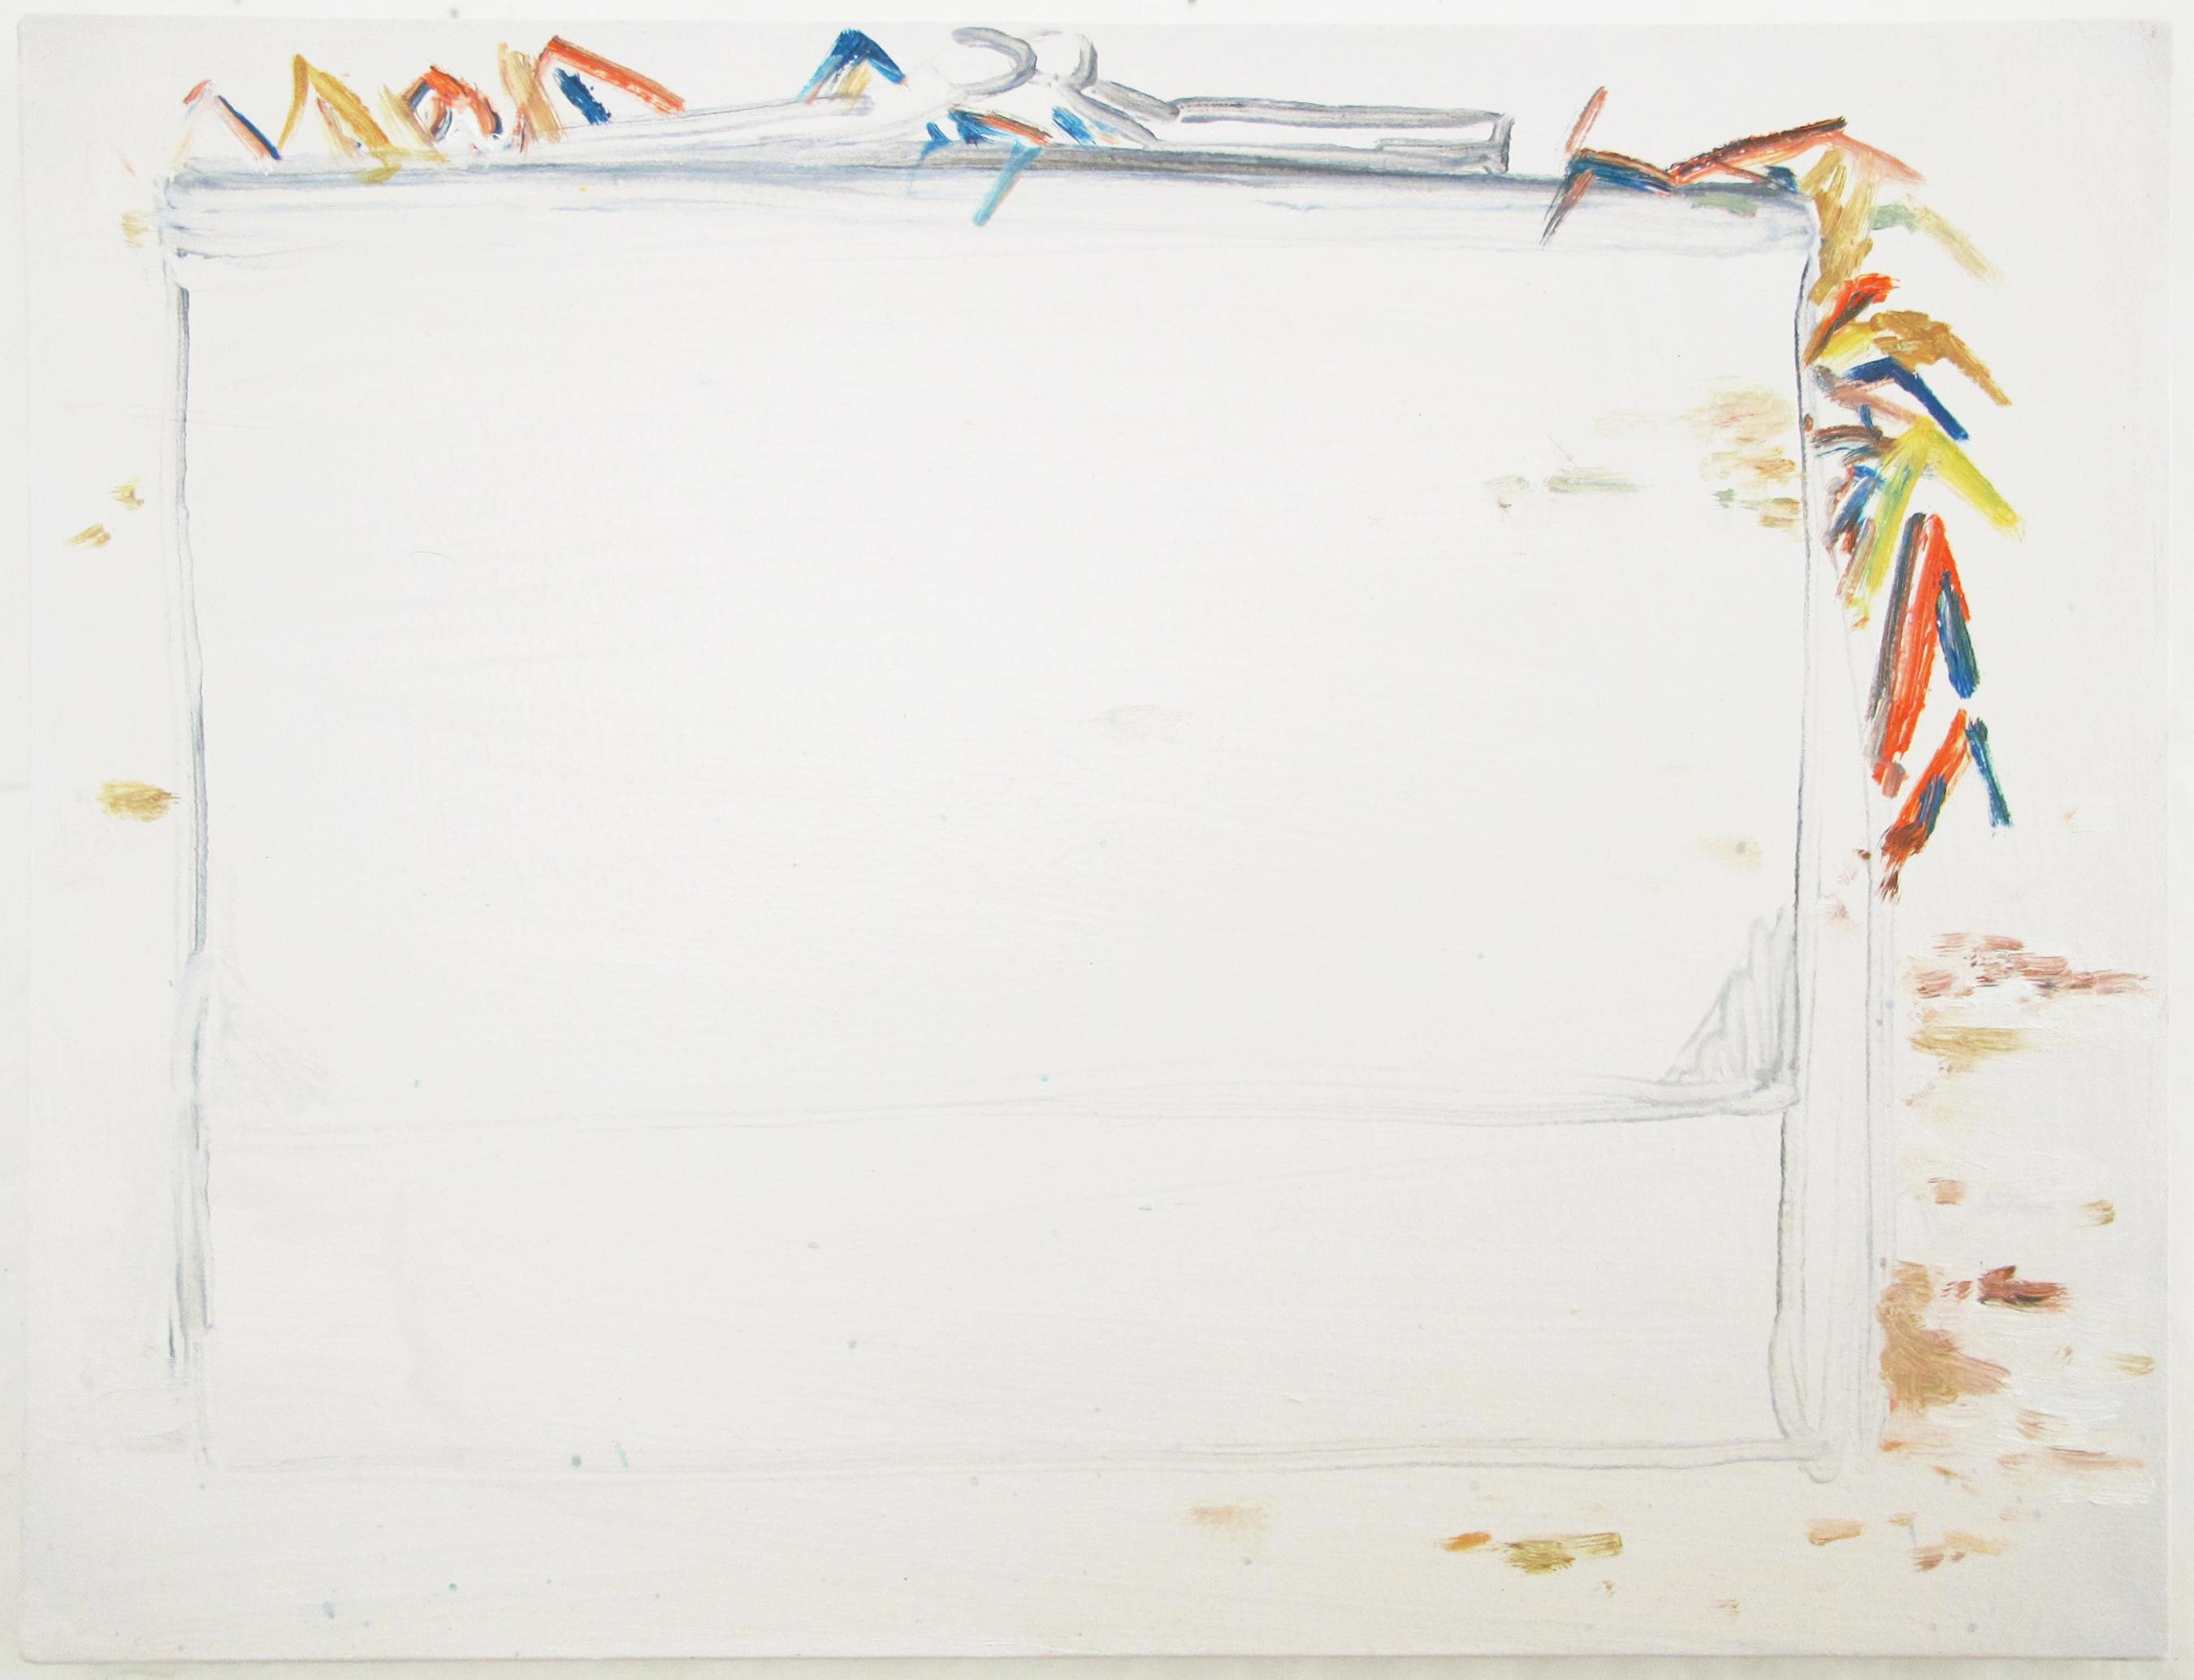 Porte-(no)monnaie, oil on canvas, 35 x 45 cm, 2017